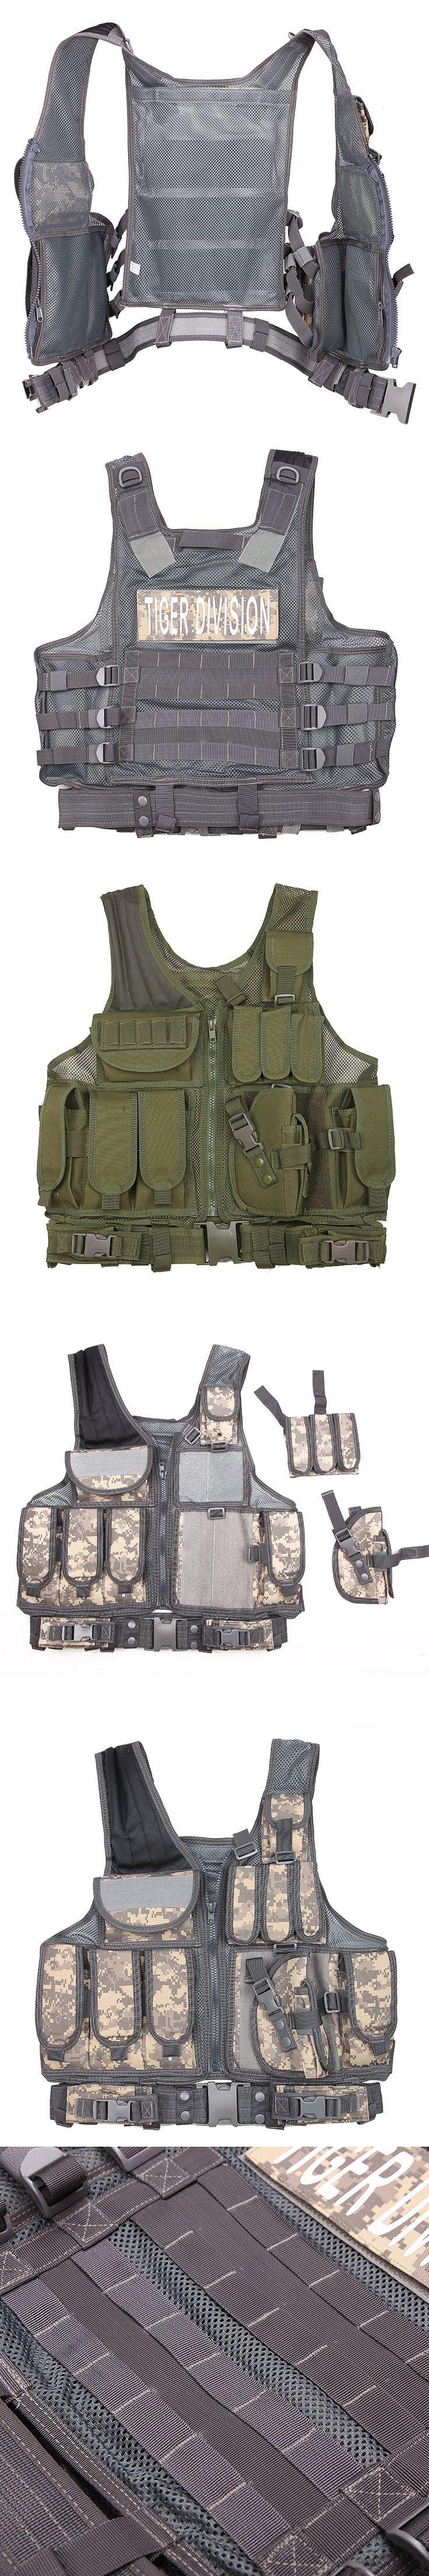 Men Tactical Vest Army Military Special Forces Combat Camo Vest Breathable Waistcoat Vest Army Swat Equipment Molle Vest